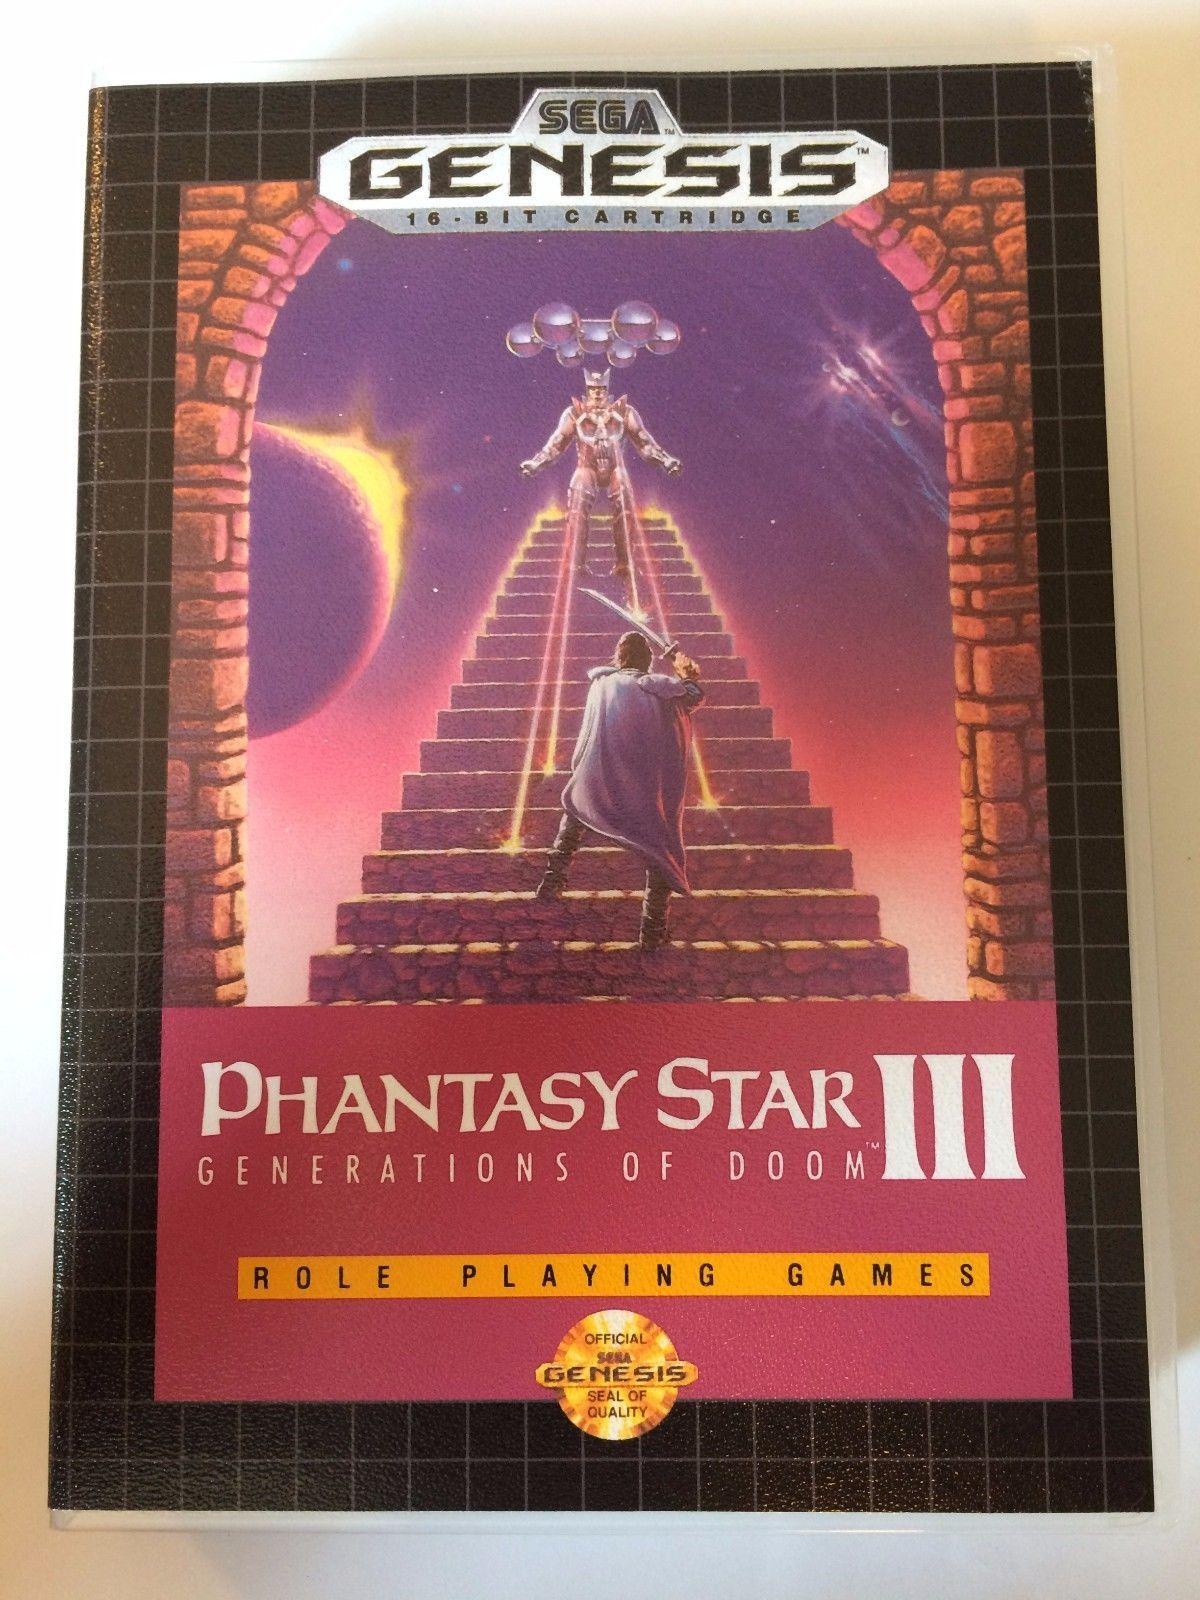 Phantasy Star III - Sega Genesis - Replacement Case - No Game